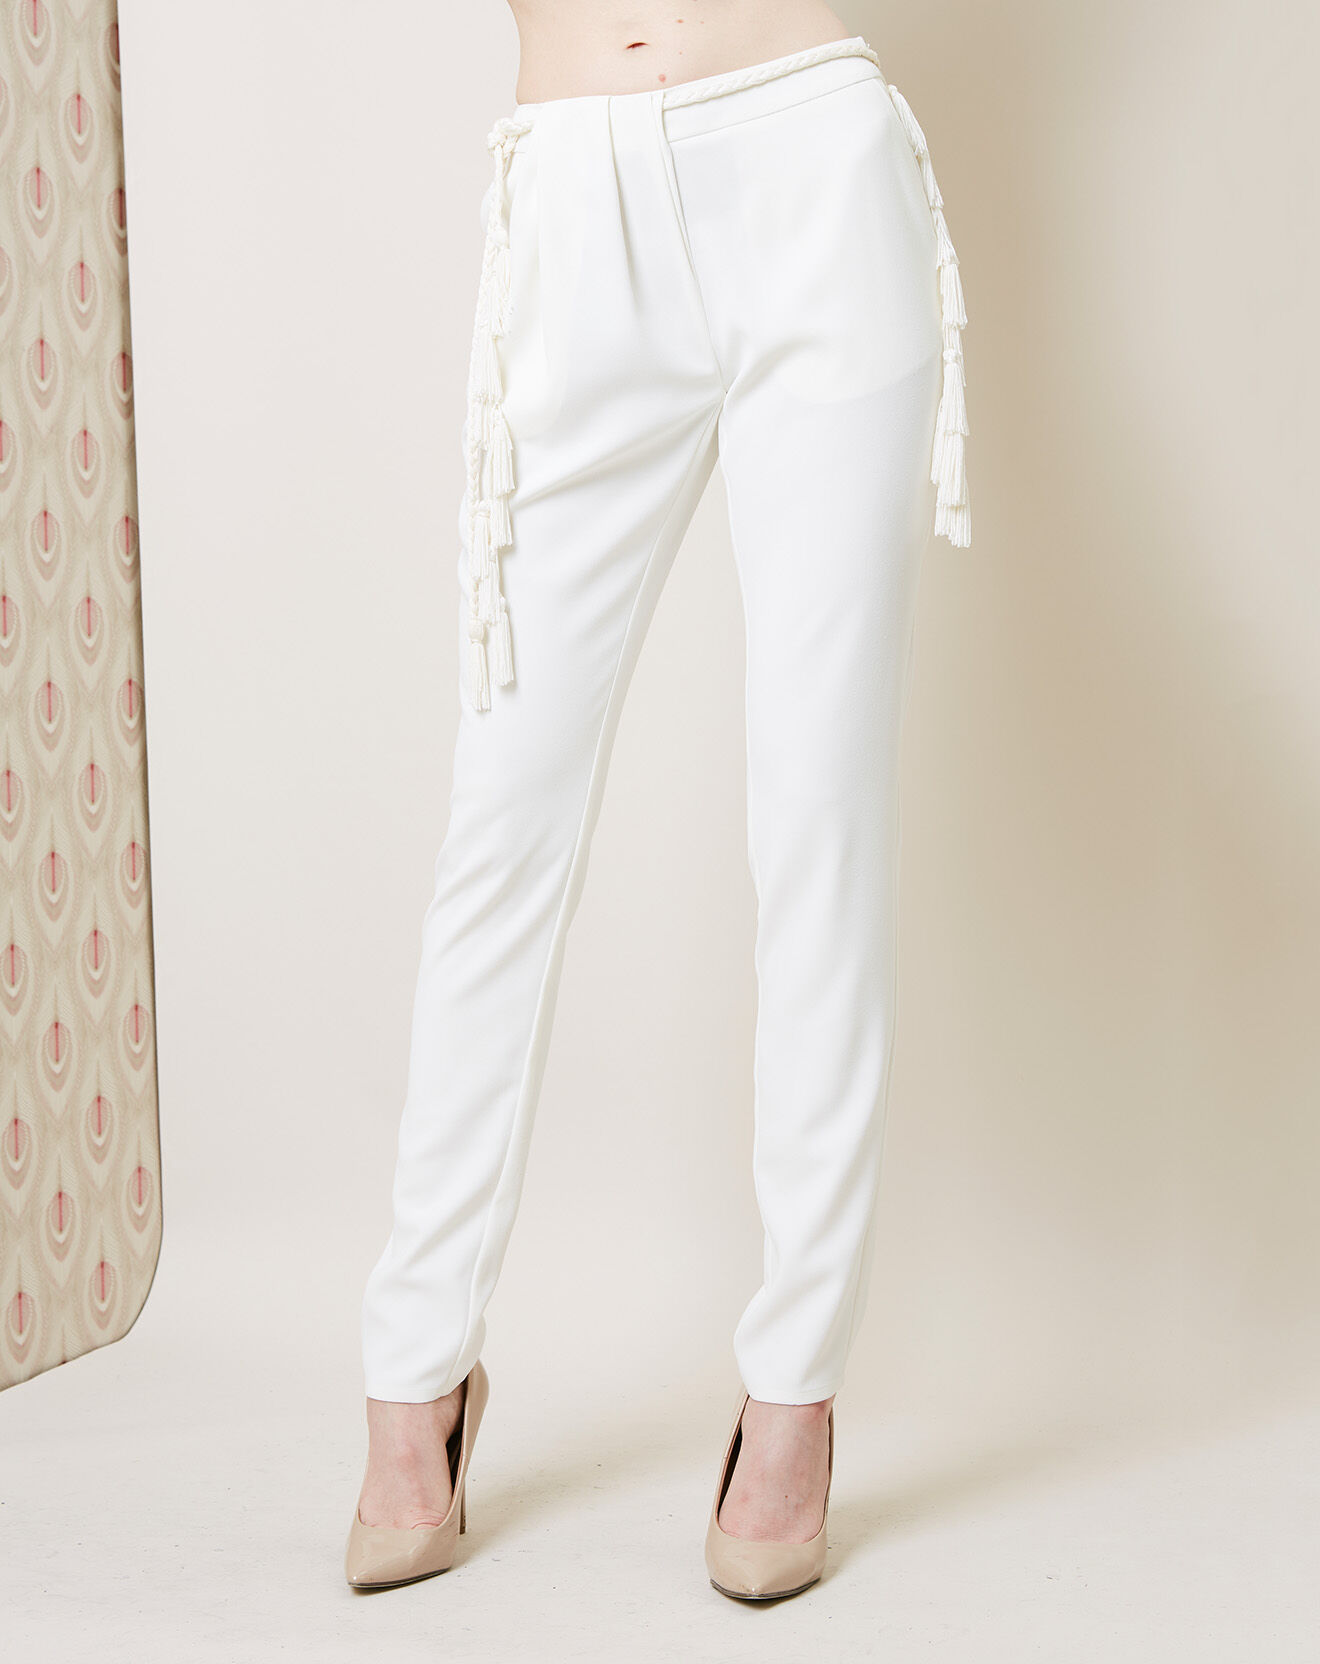 Pantalon avec ceinture écru